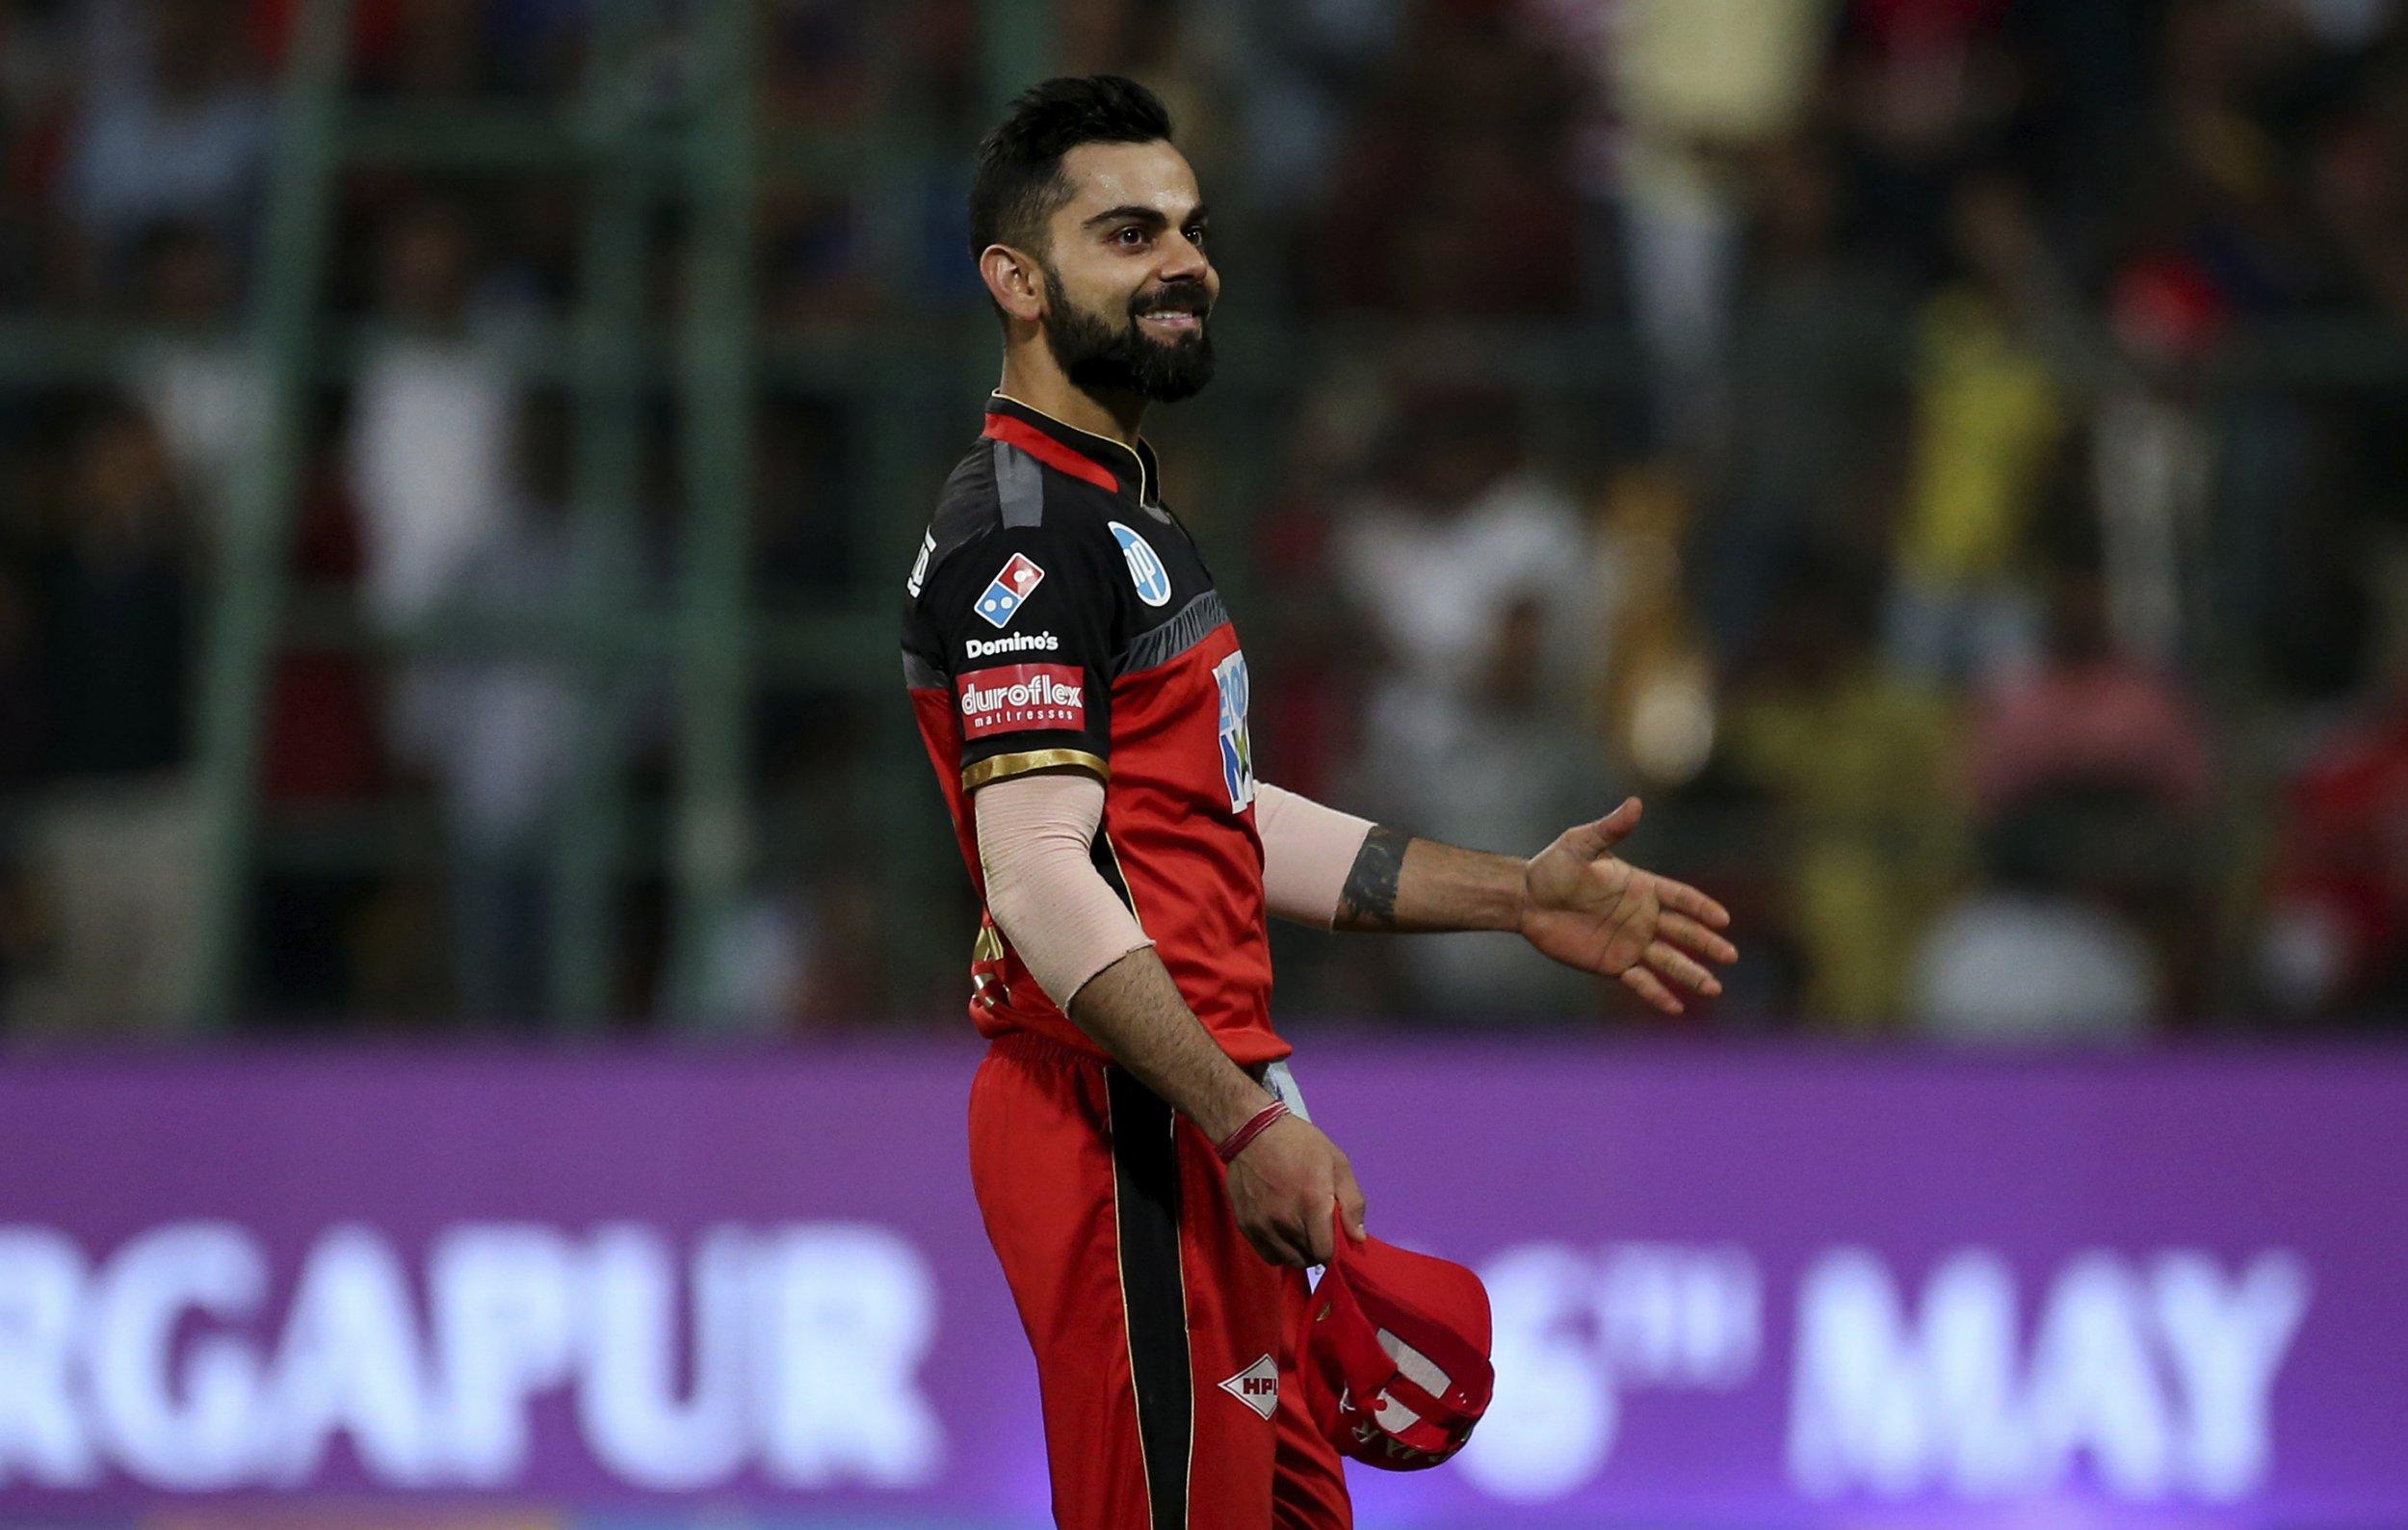 Chennai Super Kings v Royal Challengers Bangalore IPL betting preview: New Surrey signing Virat Kohli worth backing